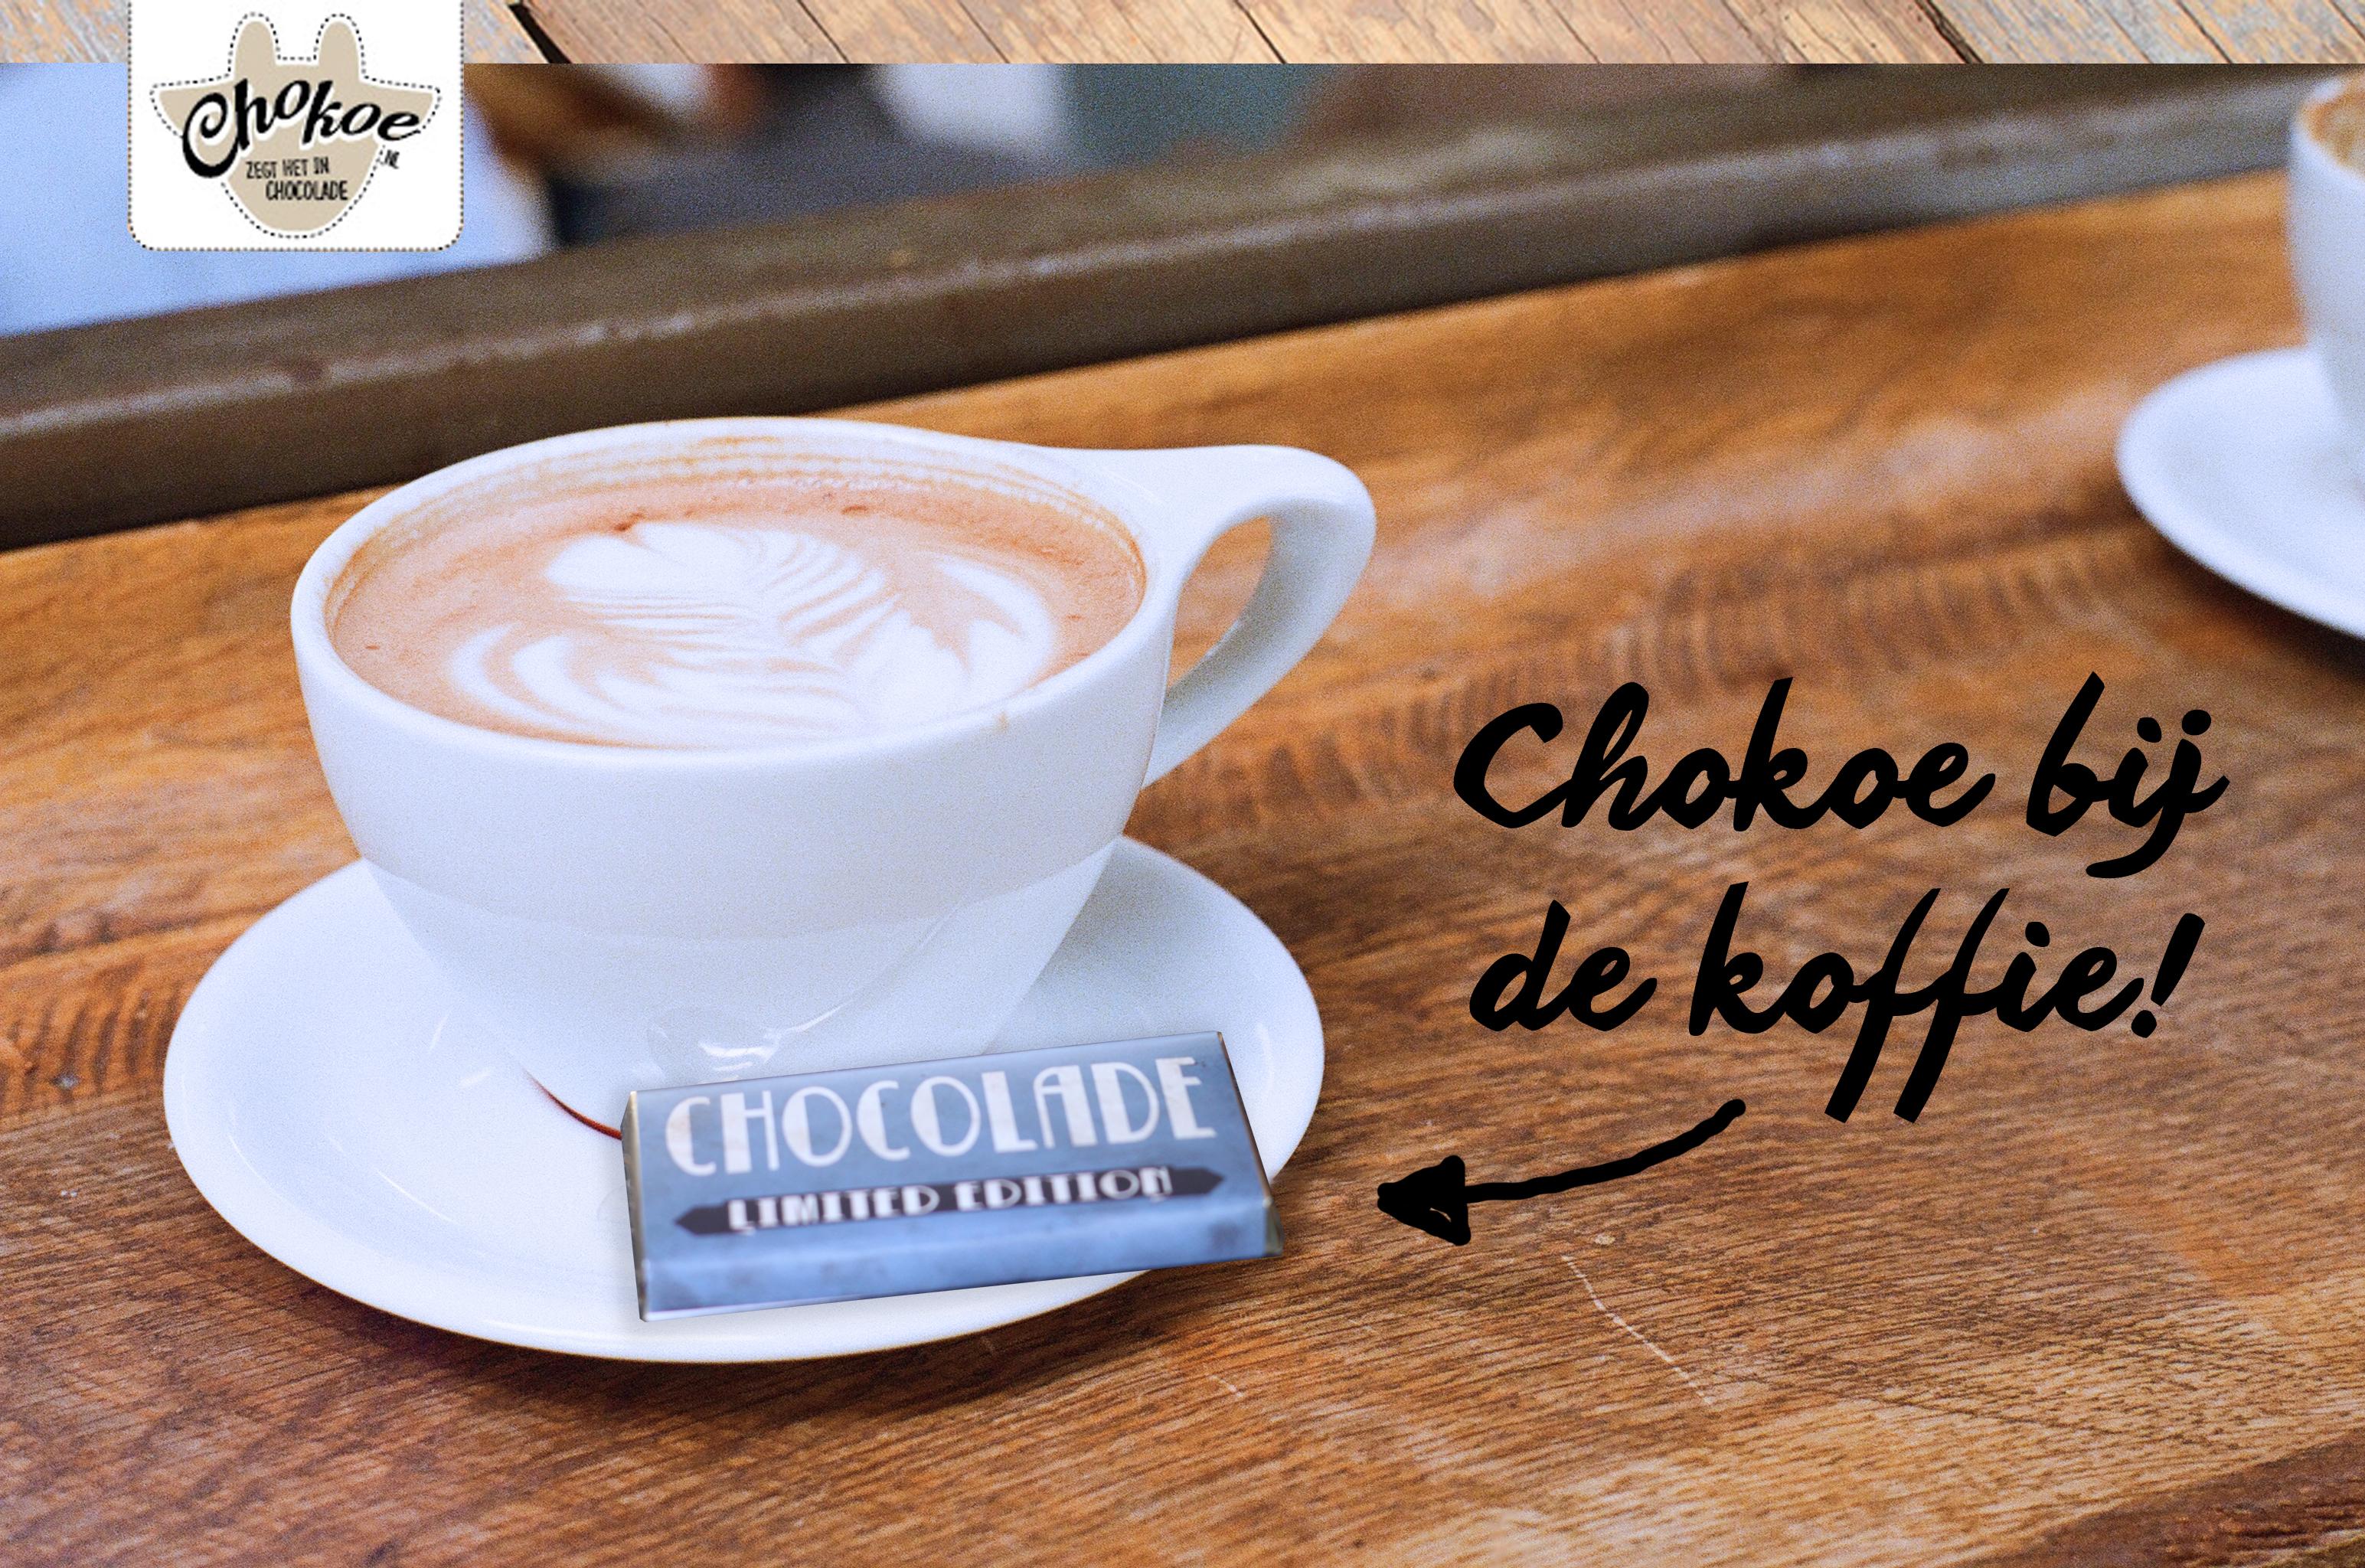 Chokoe-bij-de-koffie